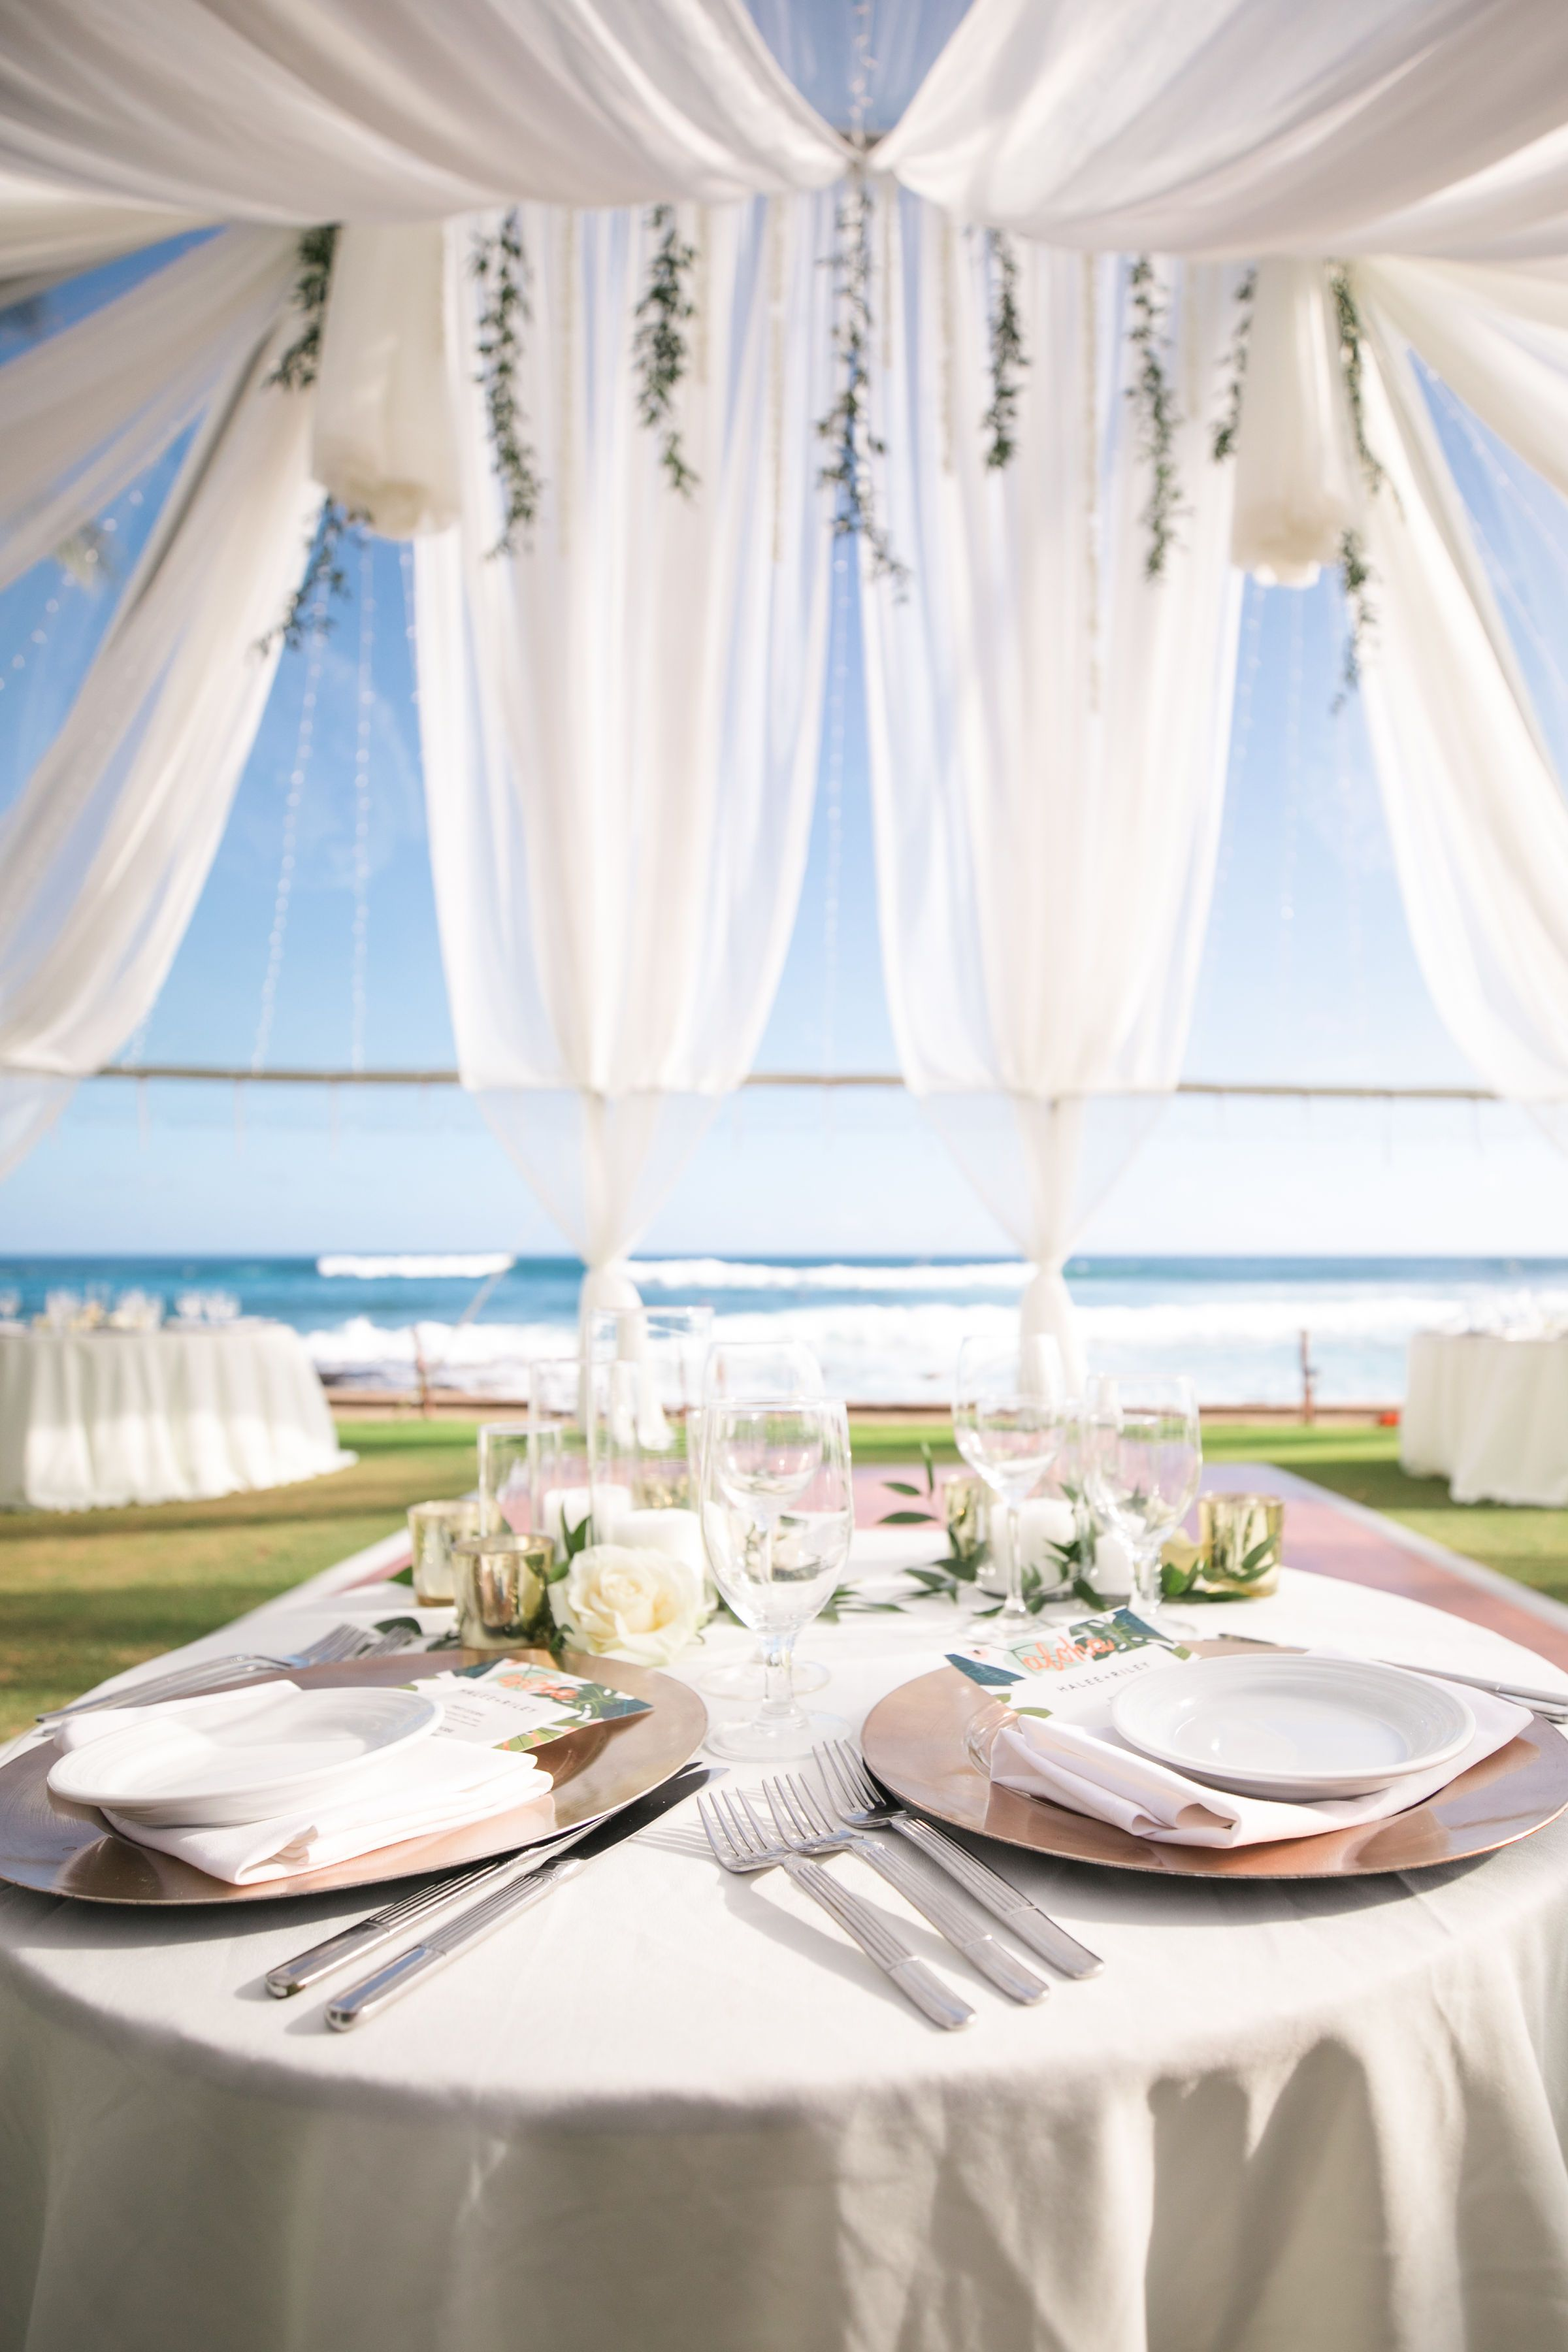 Destination Hawaii Wedding Clear Tent 30x40 40 Guests Dj